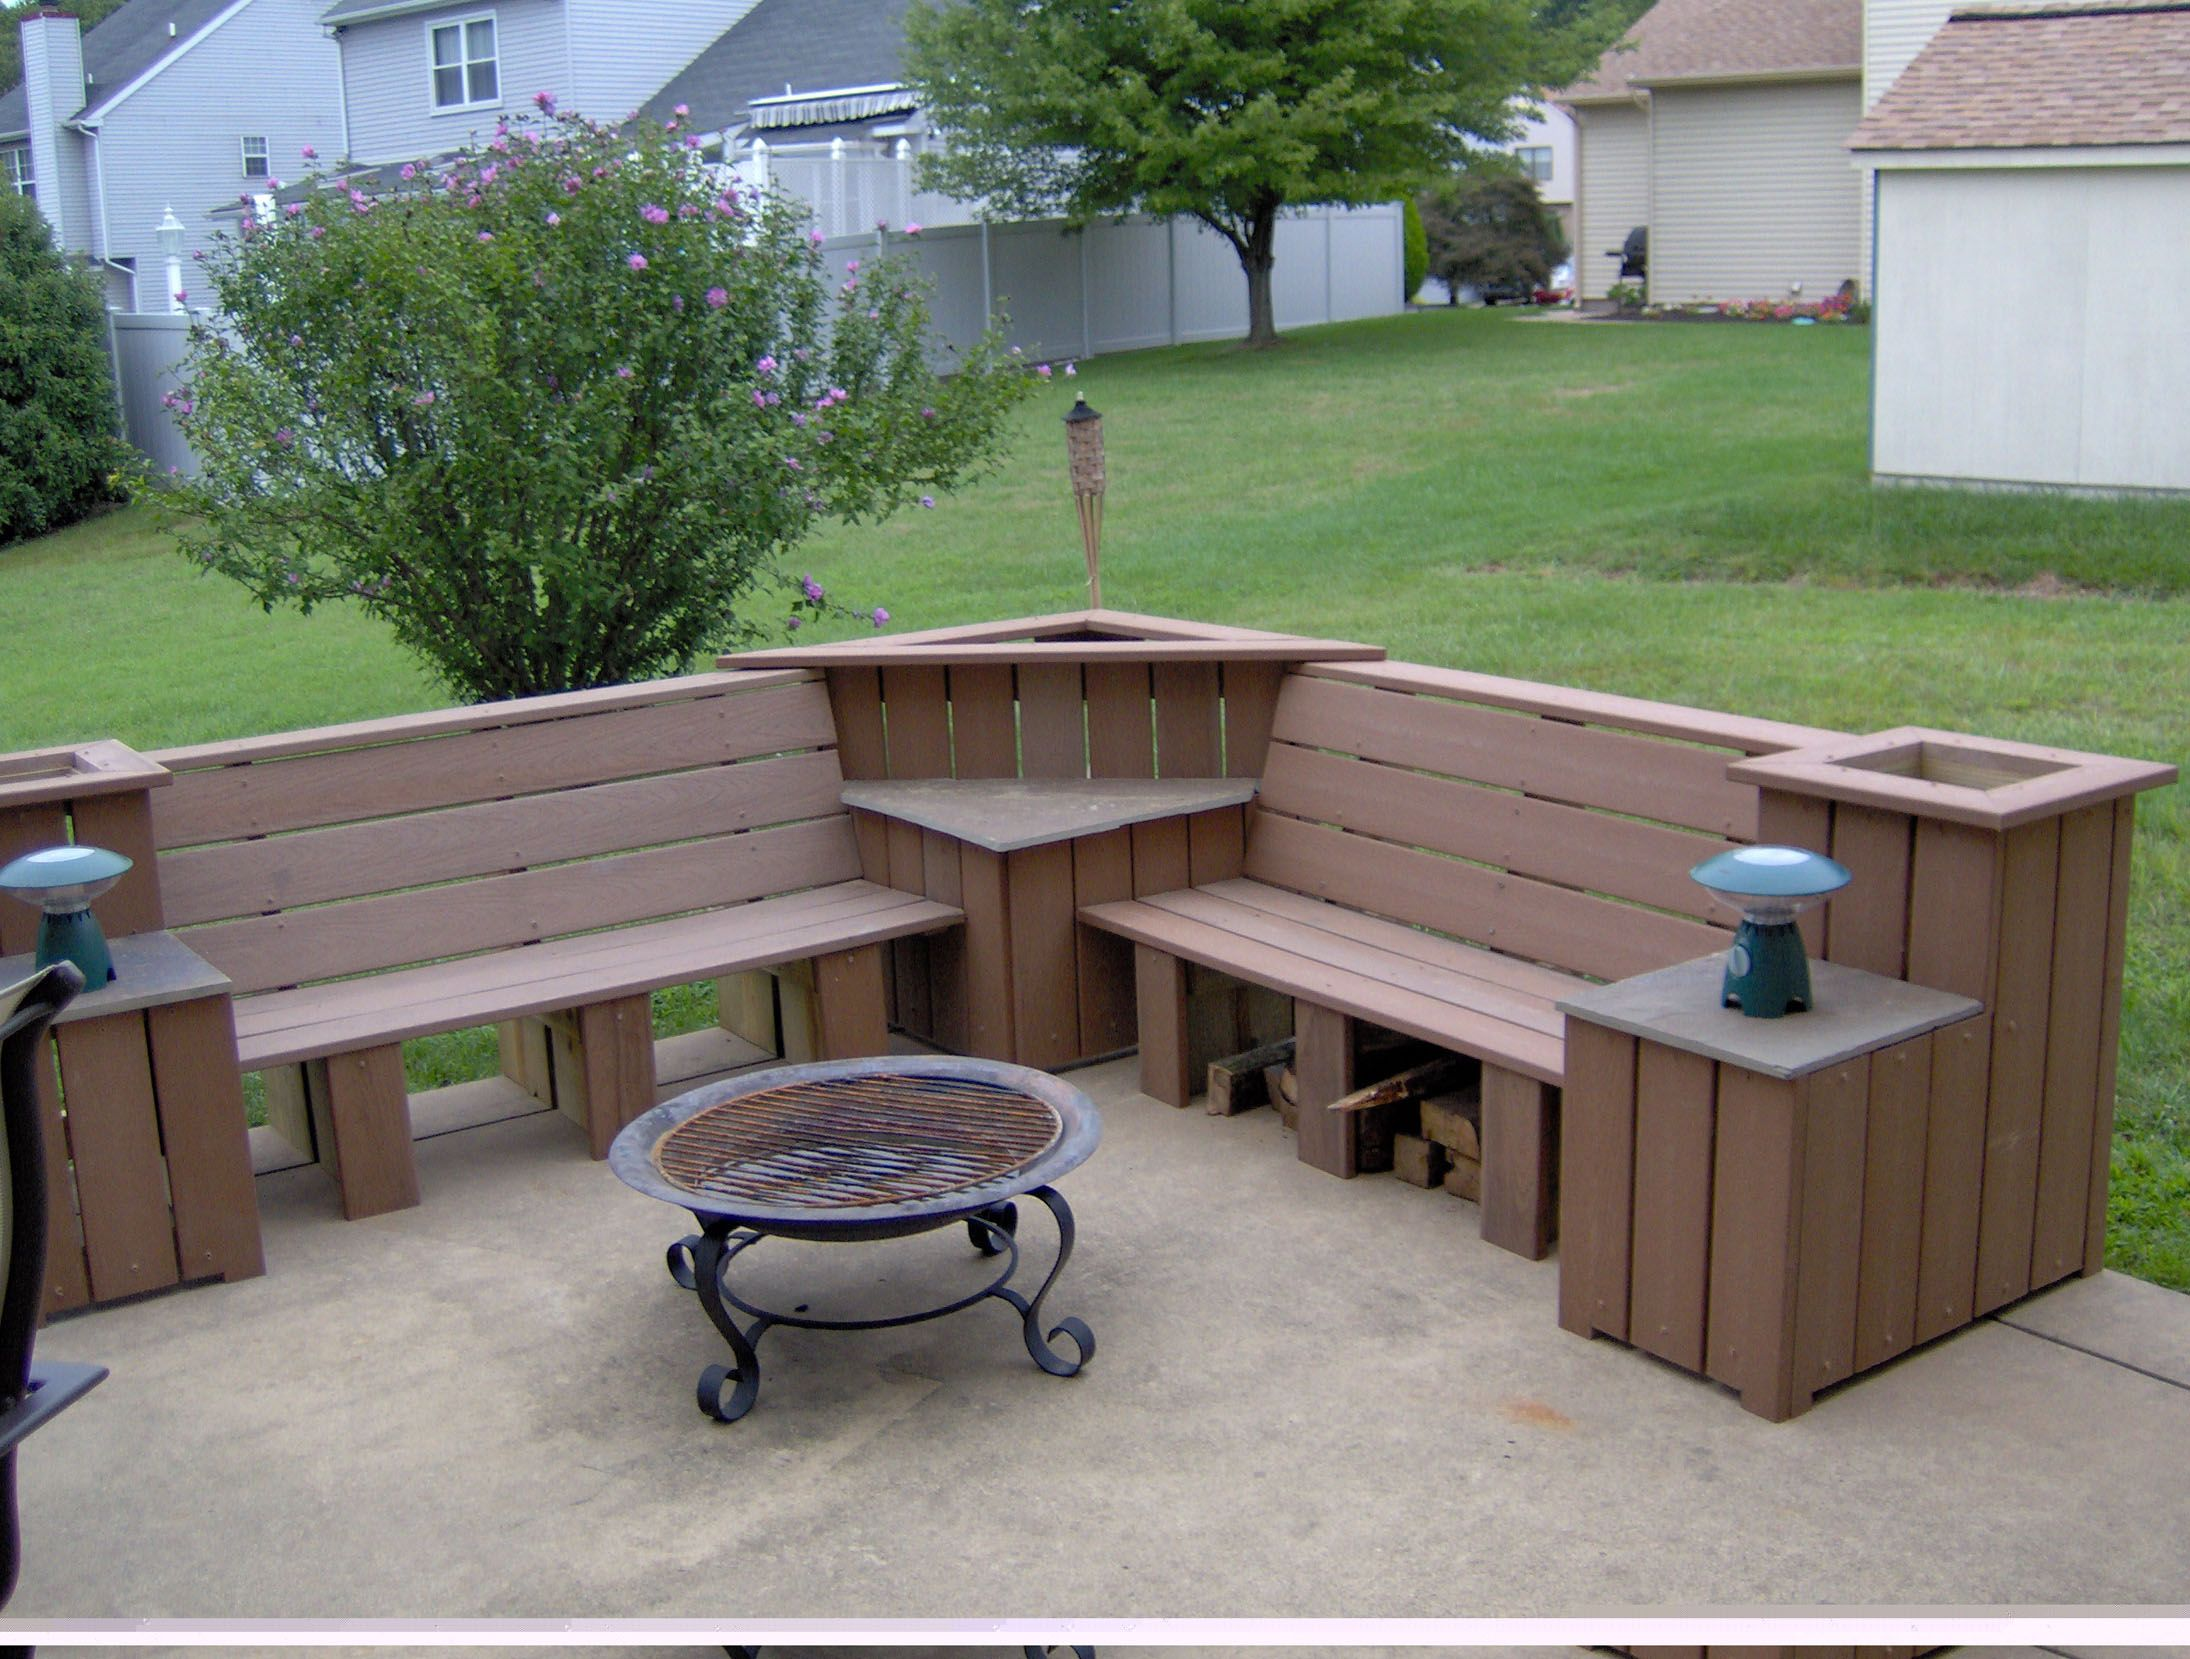 Decking ideas Benches, Decks and Diy pergola